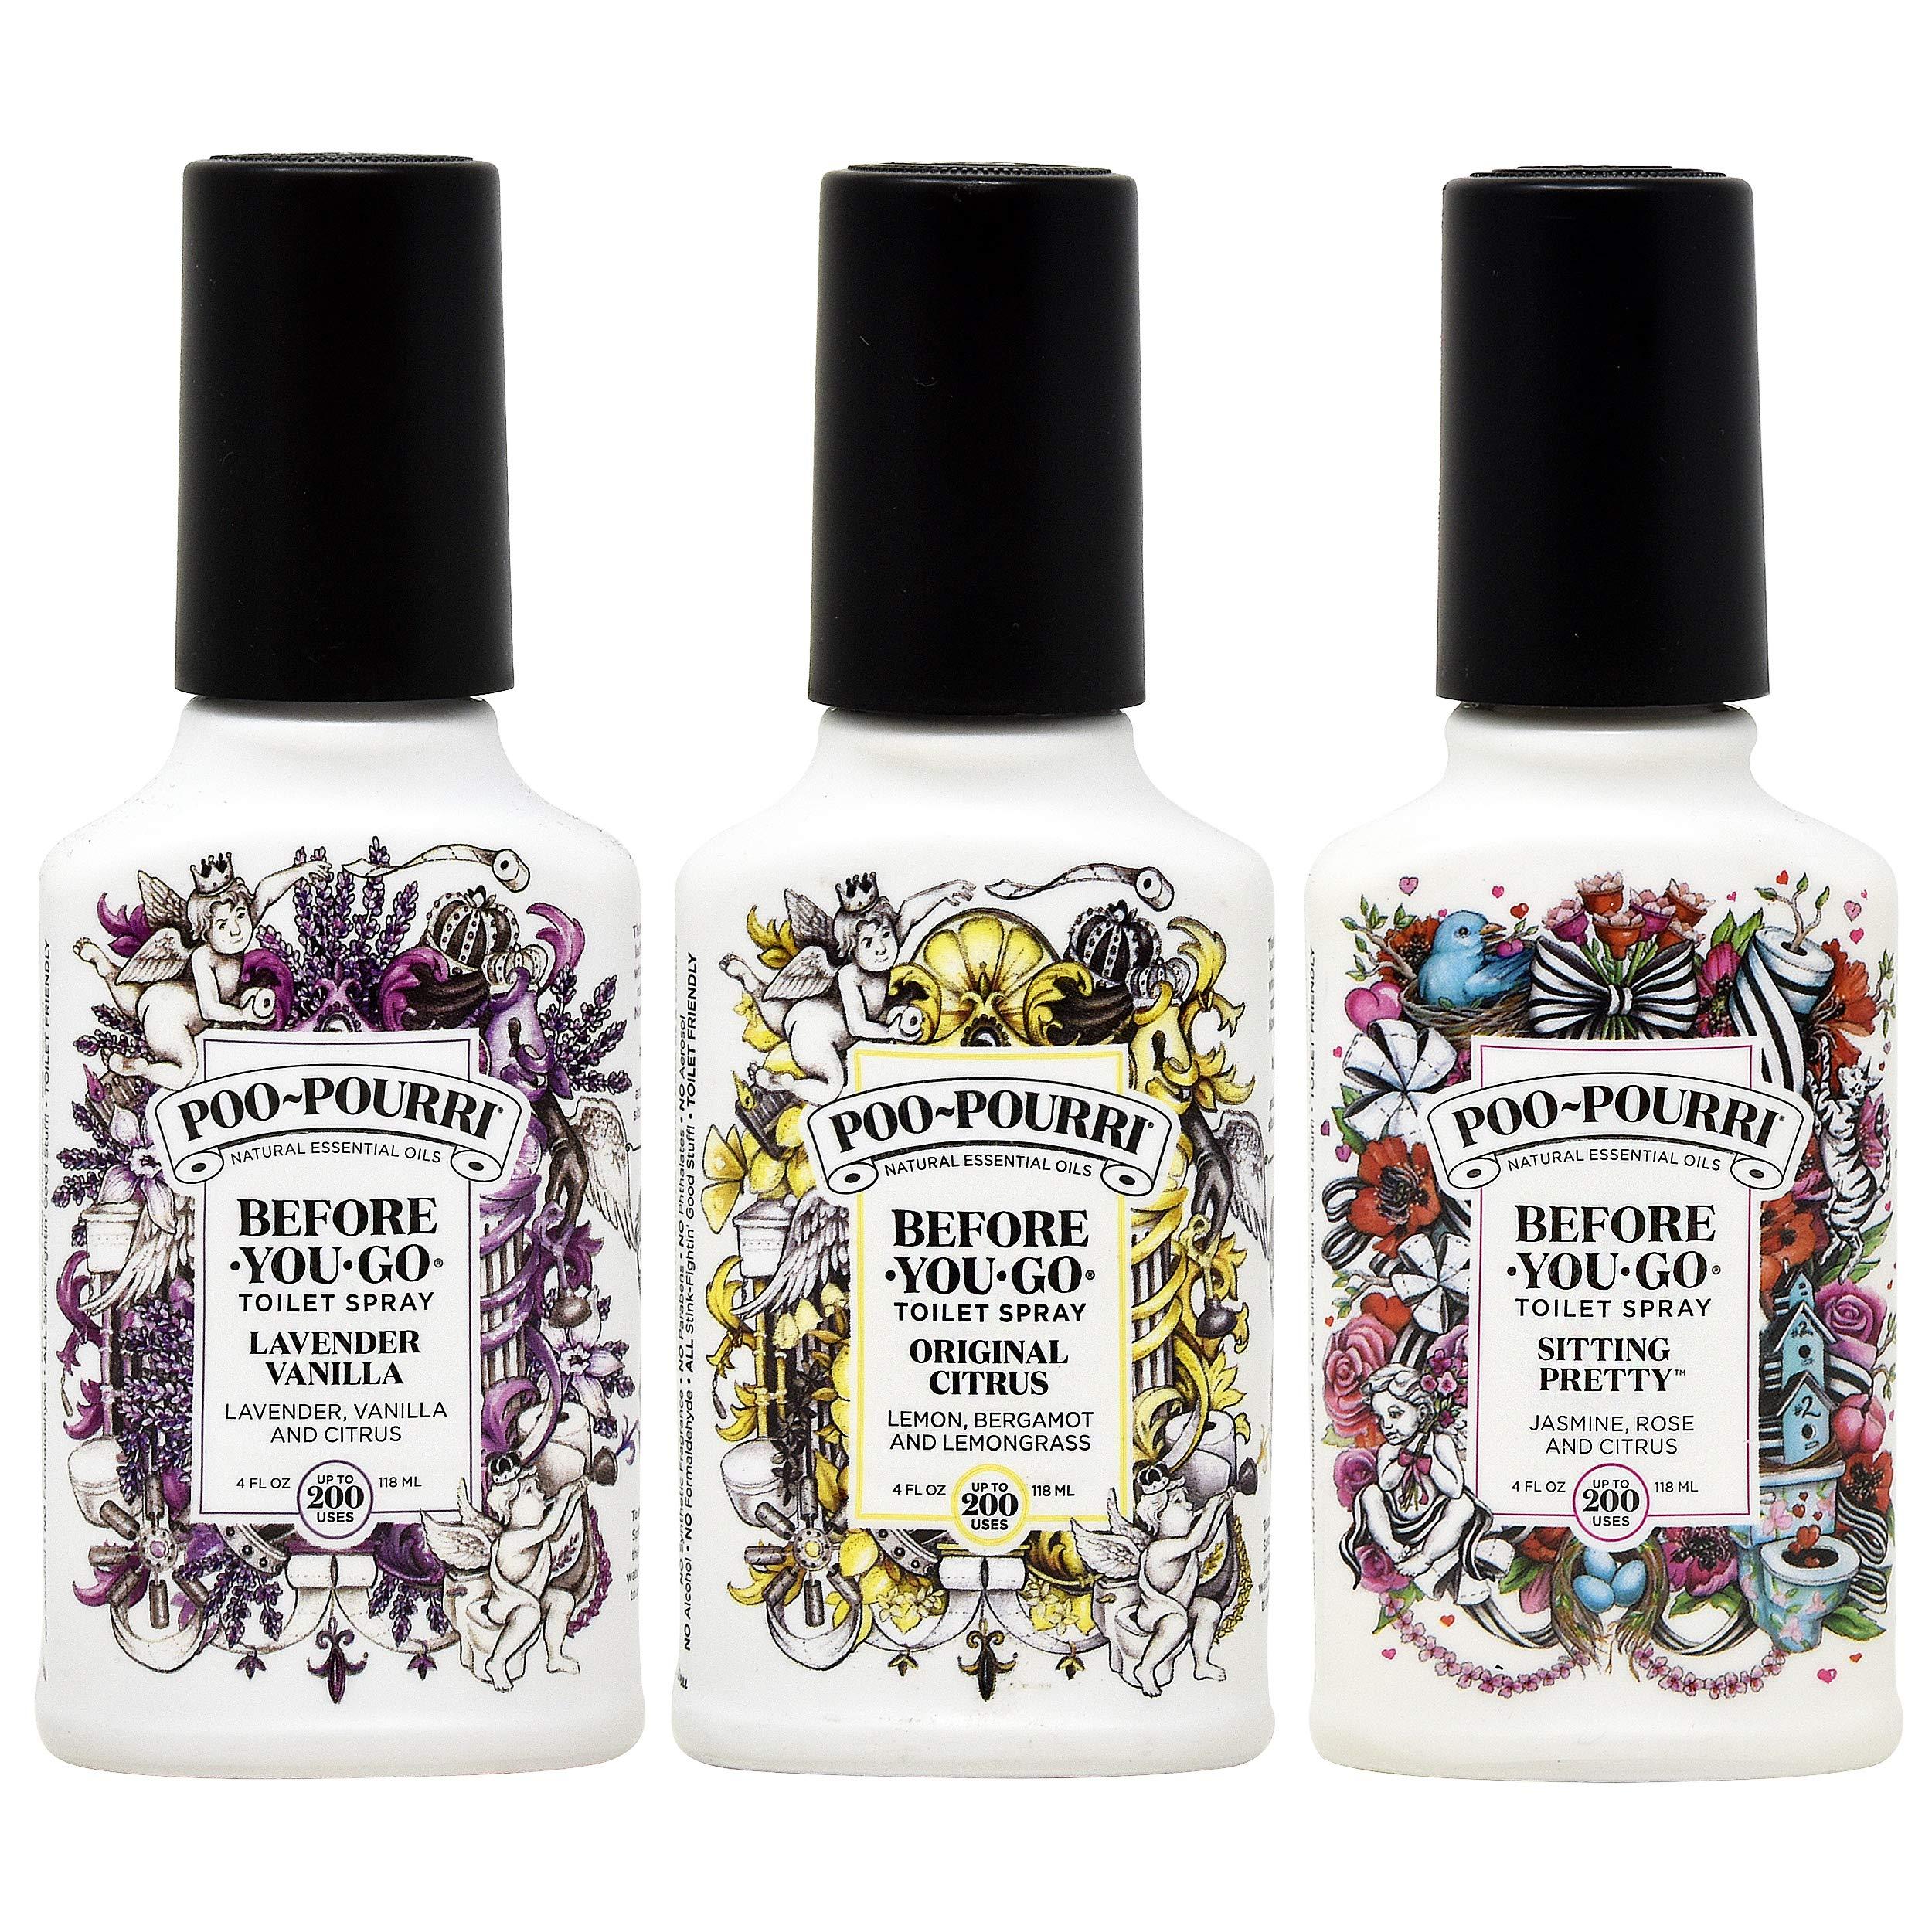 Poo-Pourri Before You Go Toilet Spray Original Citrus, Lavender Vanilla and Sitting Pretty 4 Ounce Bottles